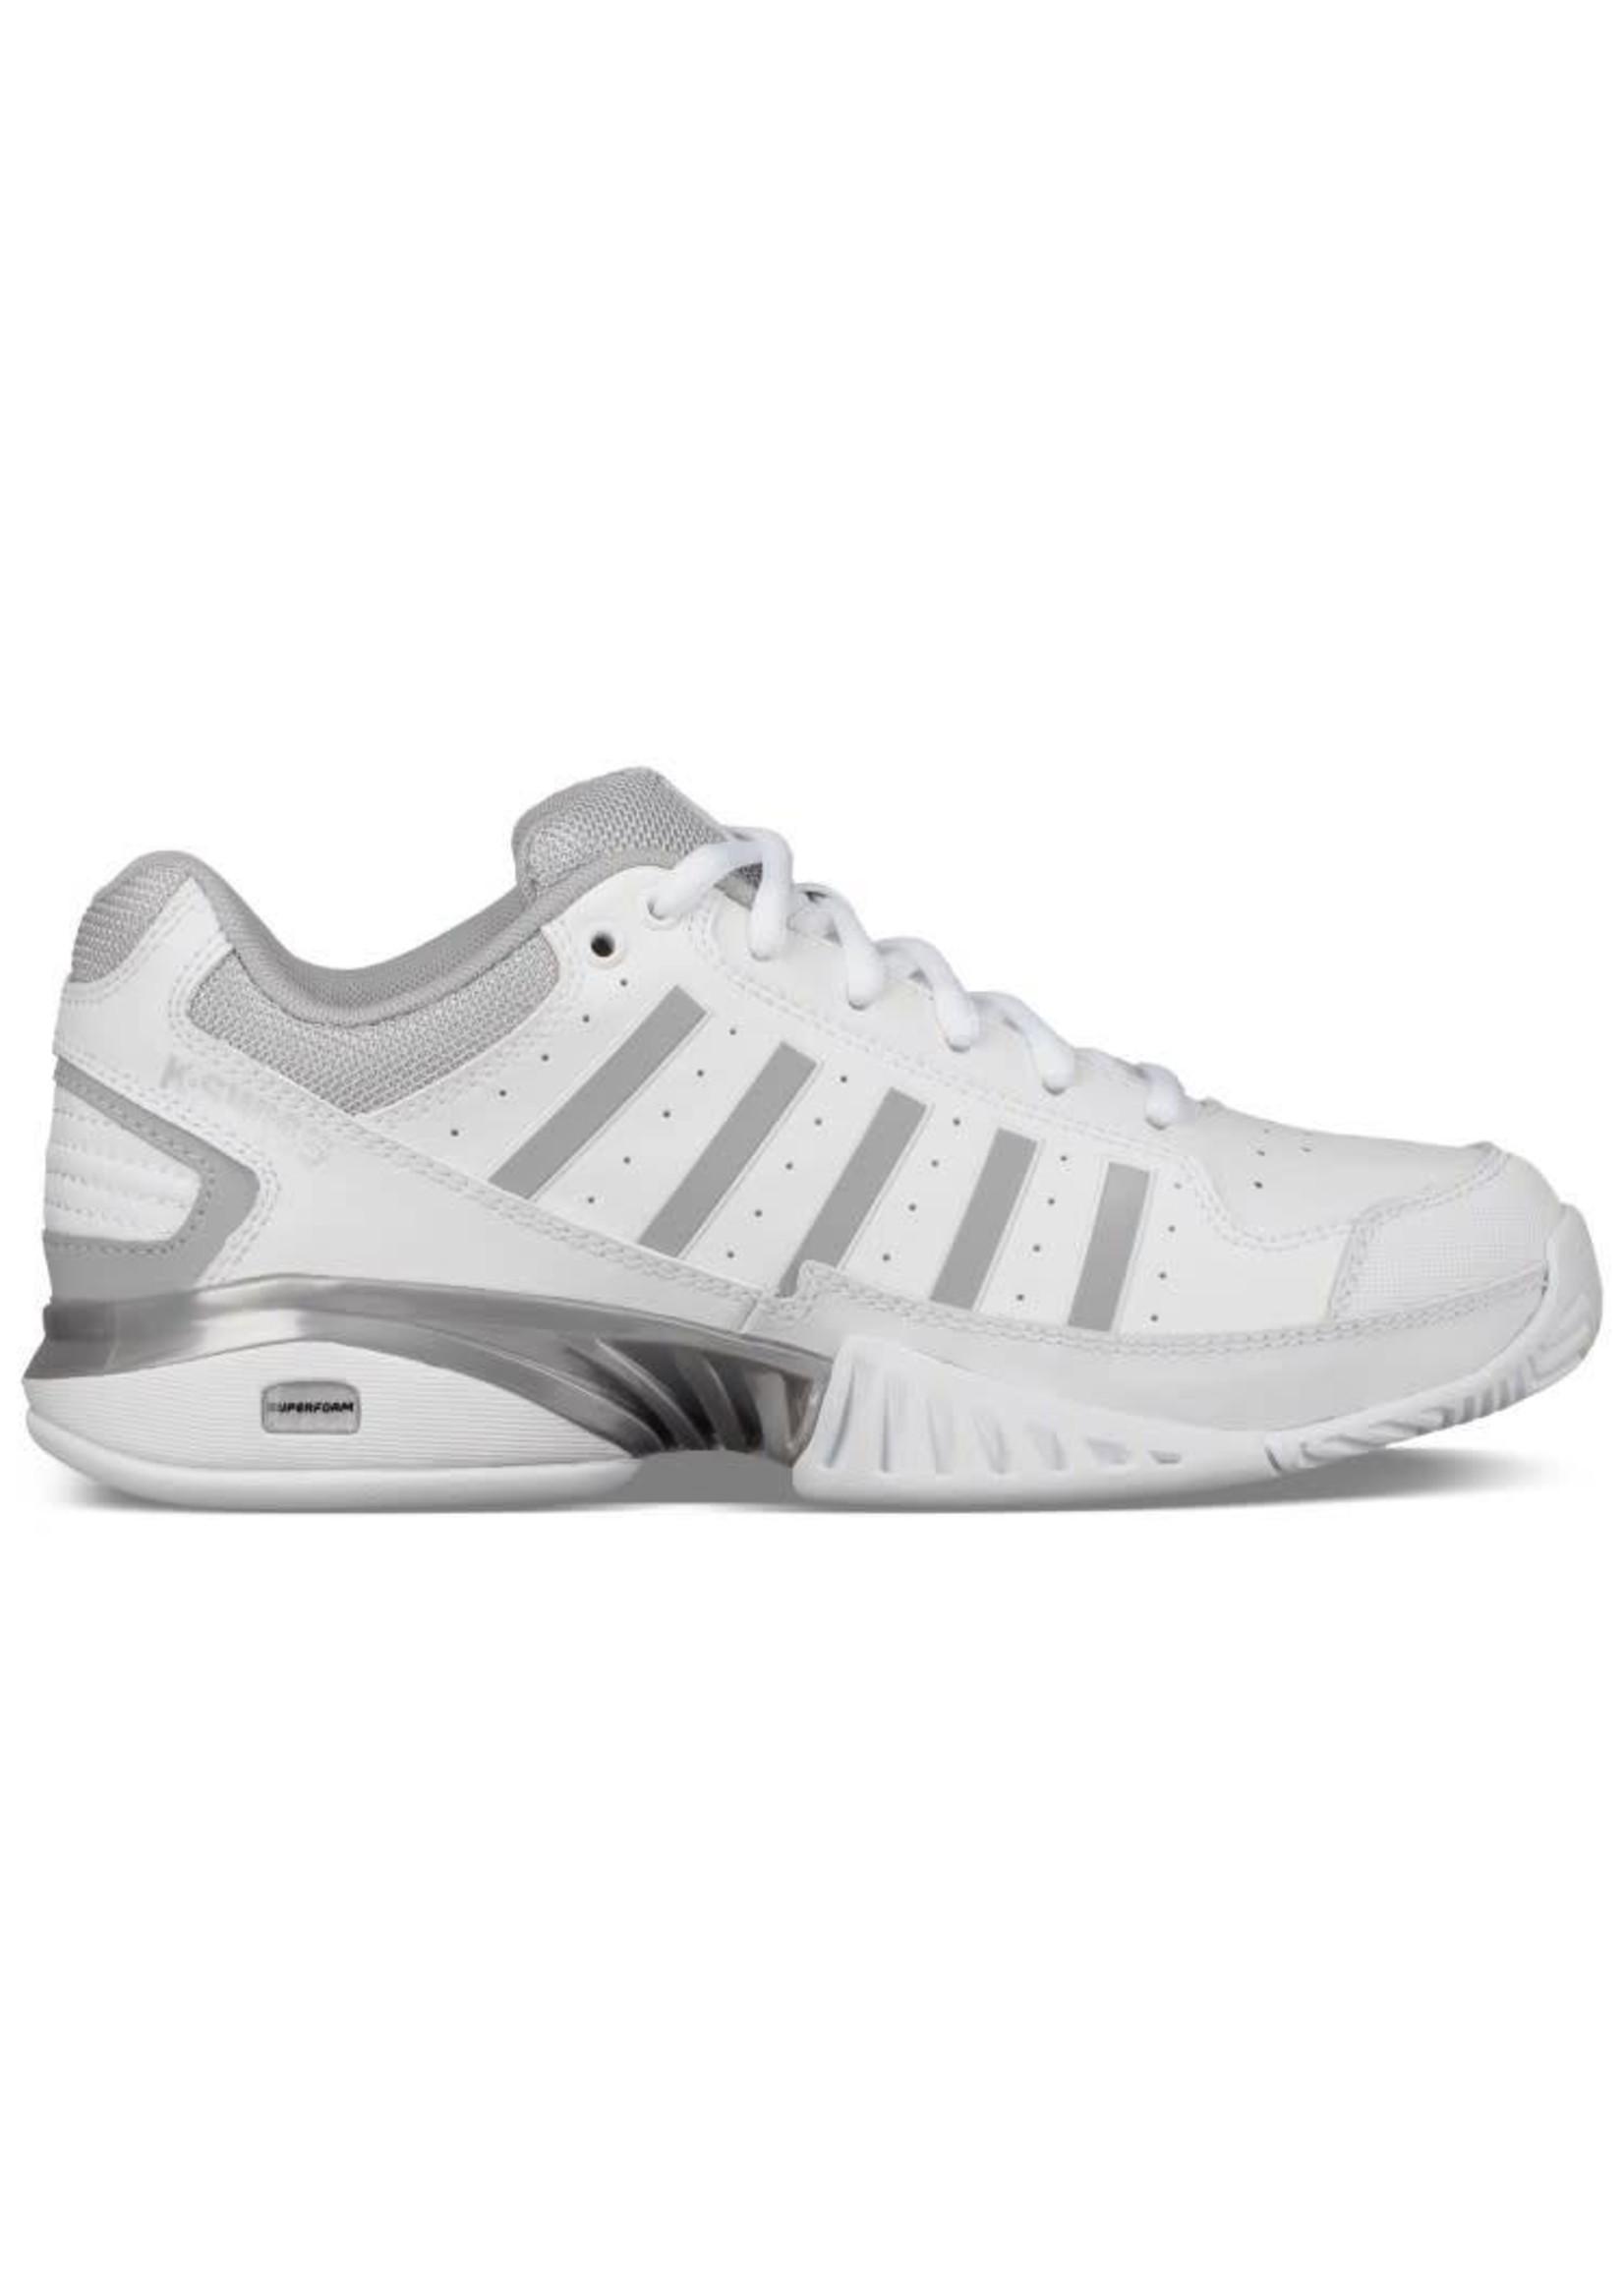 K Swiss K Swiss Receiver 4 Omni Womens Tennis Shoes (2018)